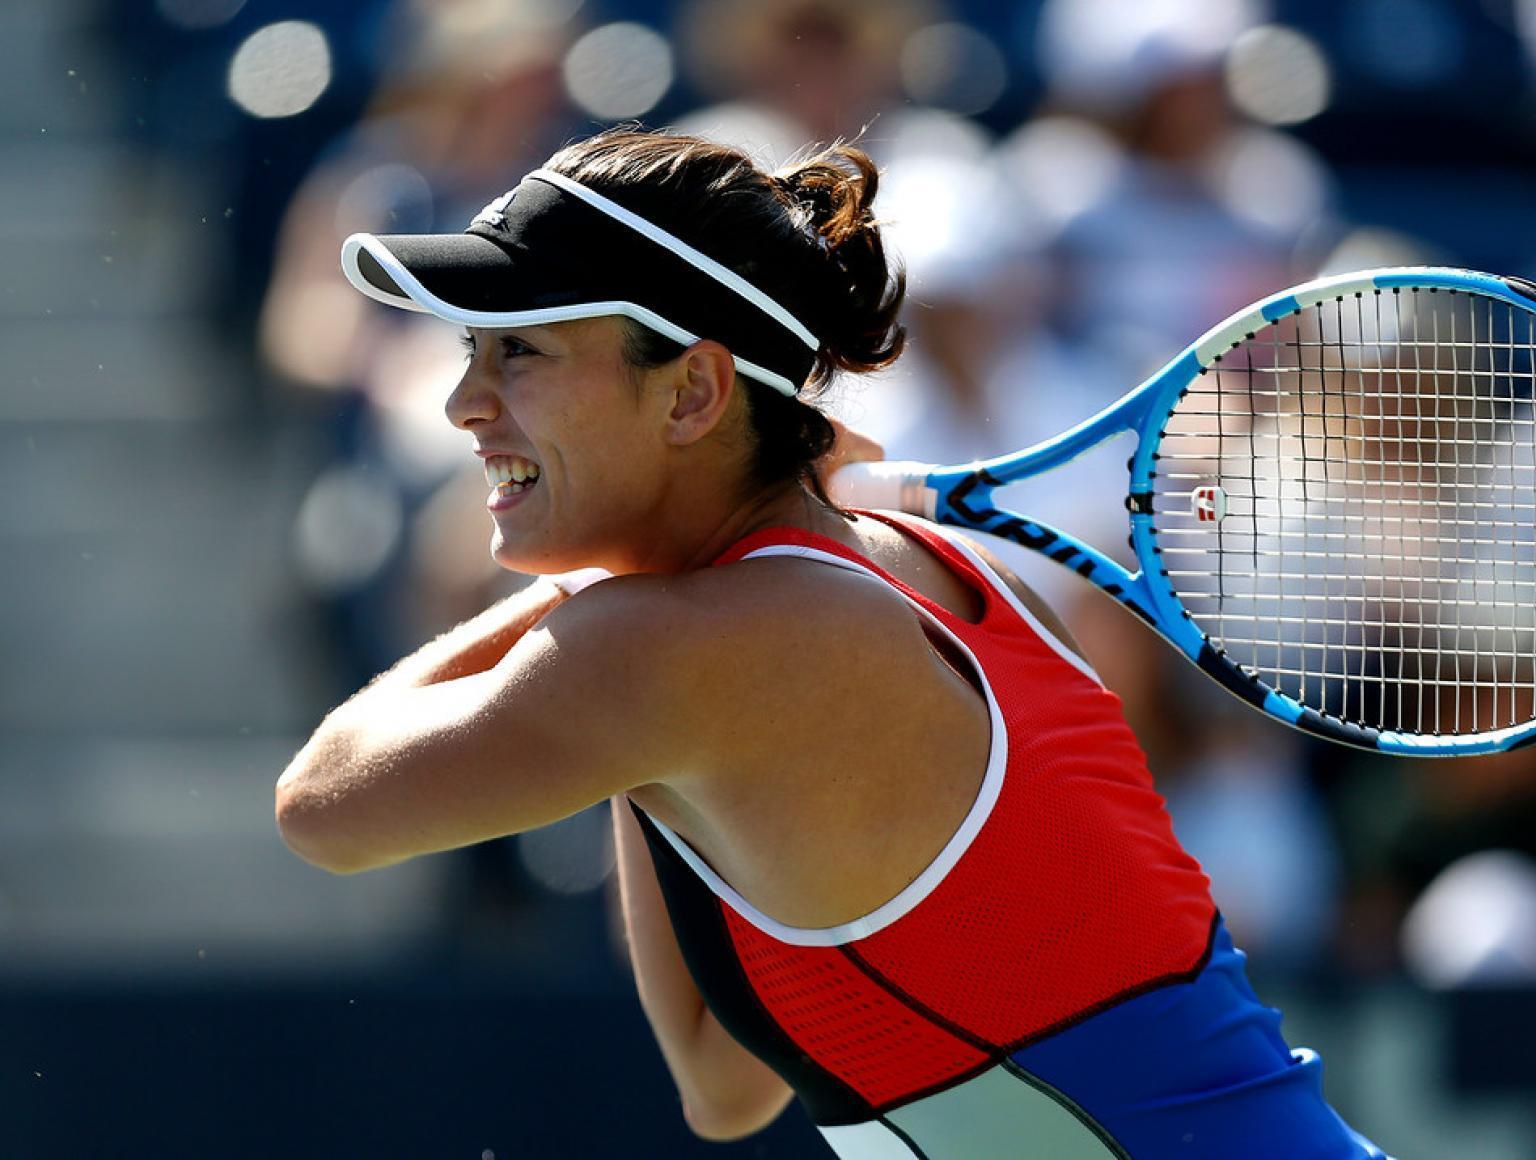 Women's Tennis: Muguruja wins Monterey Open title